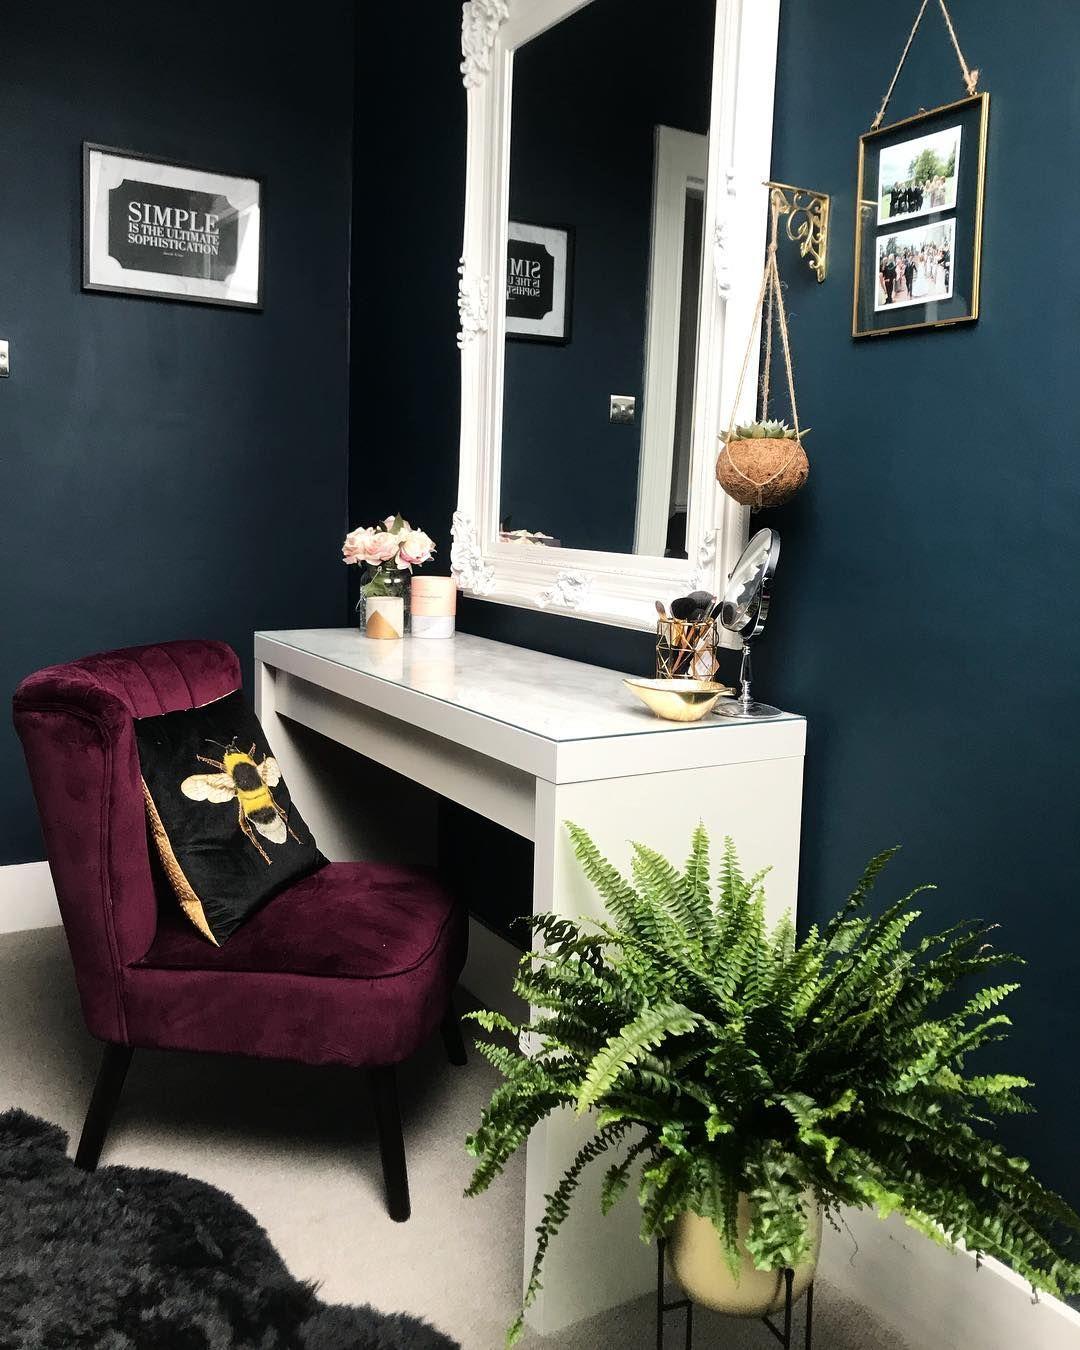 Farrow Ball Hague Blue Paint Color Schemes Living Room Grey Living Room Color Schemes Small Living Room Design #small #living #room #color #schemes